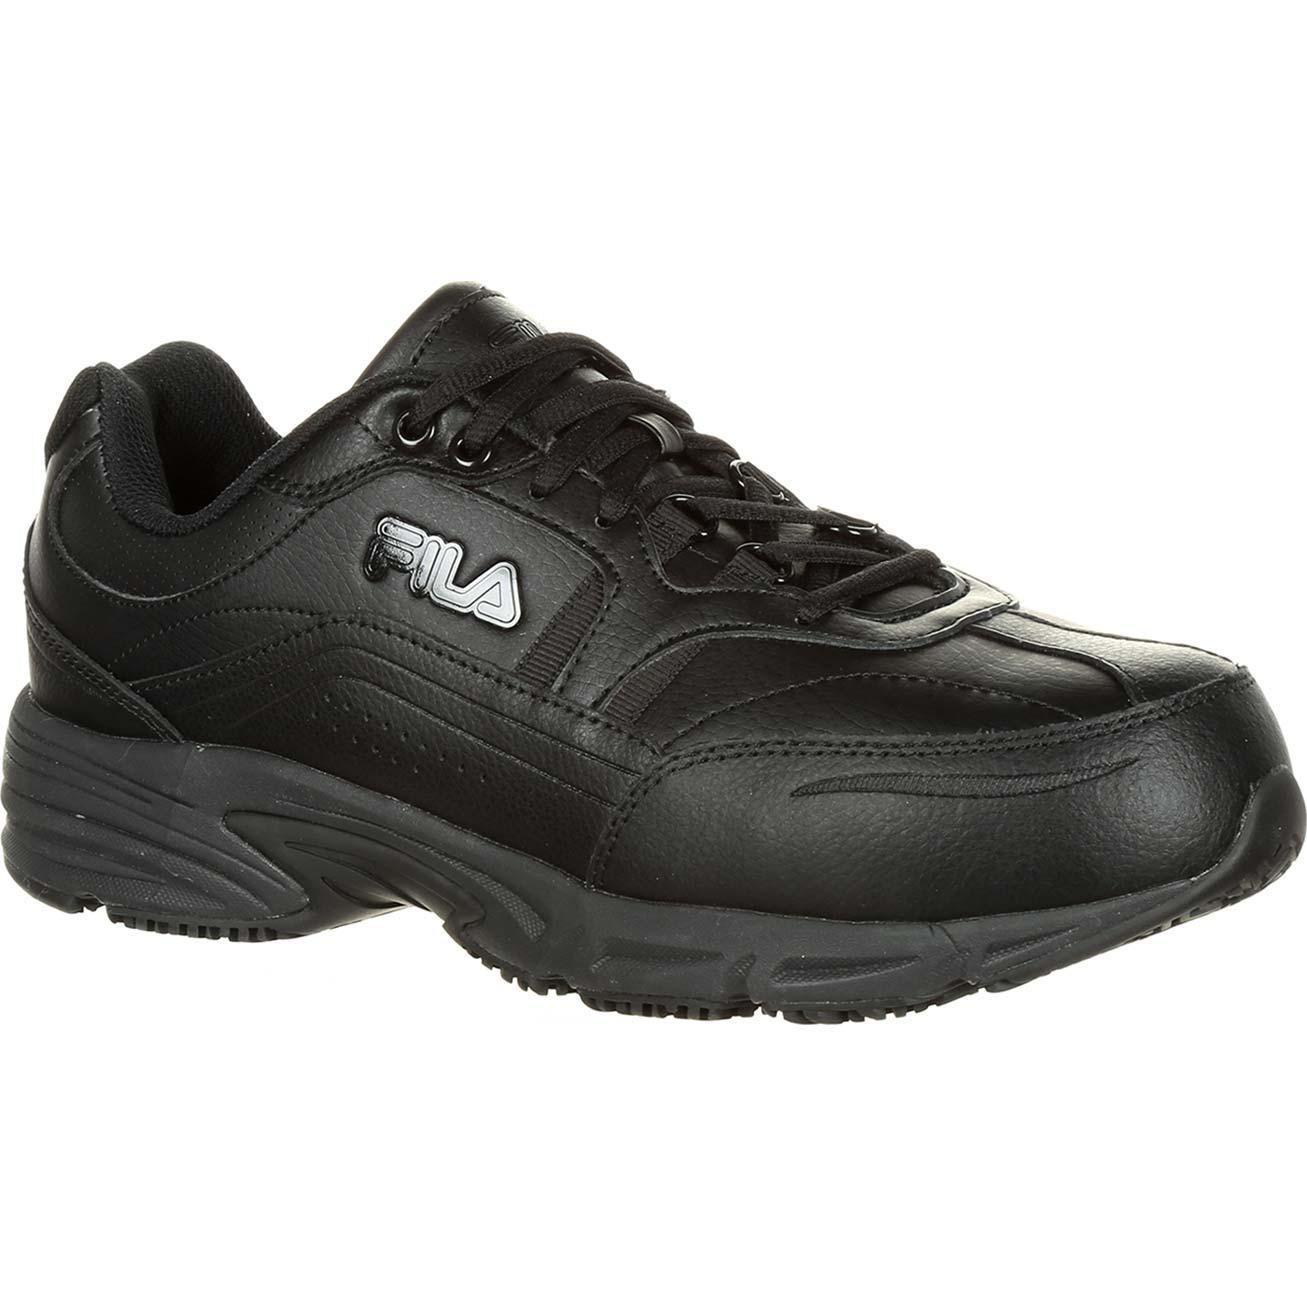 c518643cc7 Fila Memory Workshift Composite Toe Slip-Resistant Work Athletic Shoe